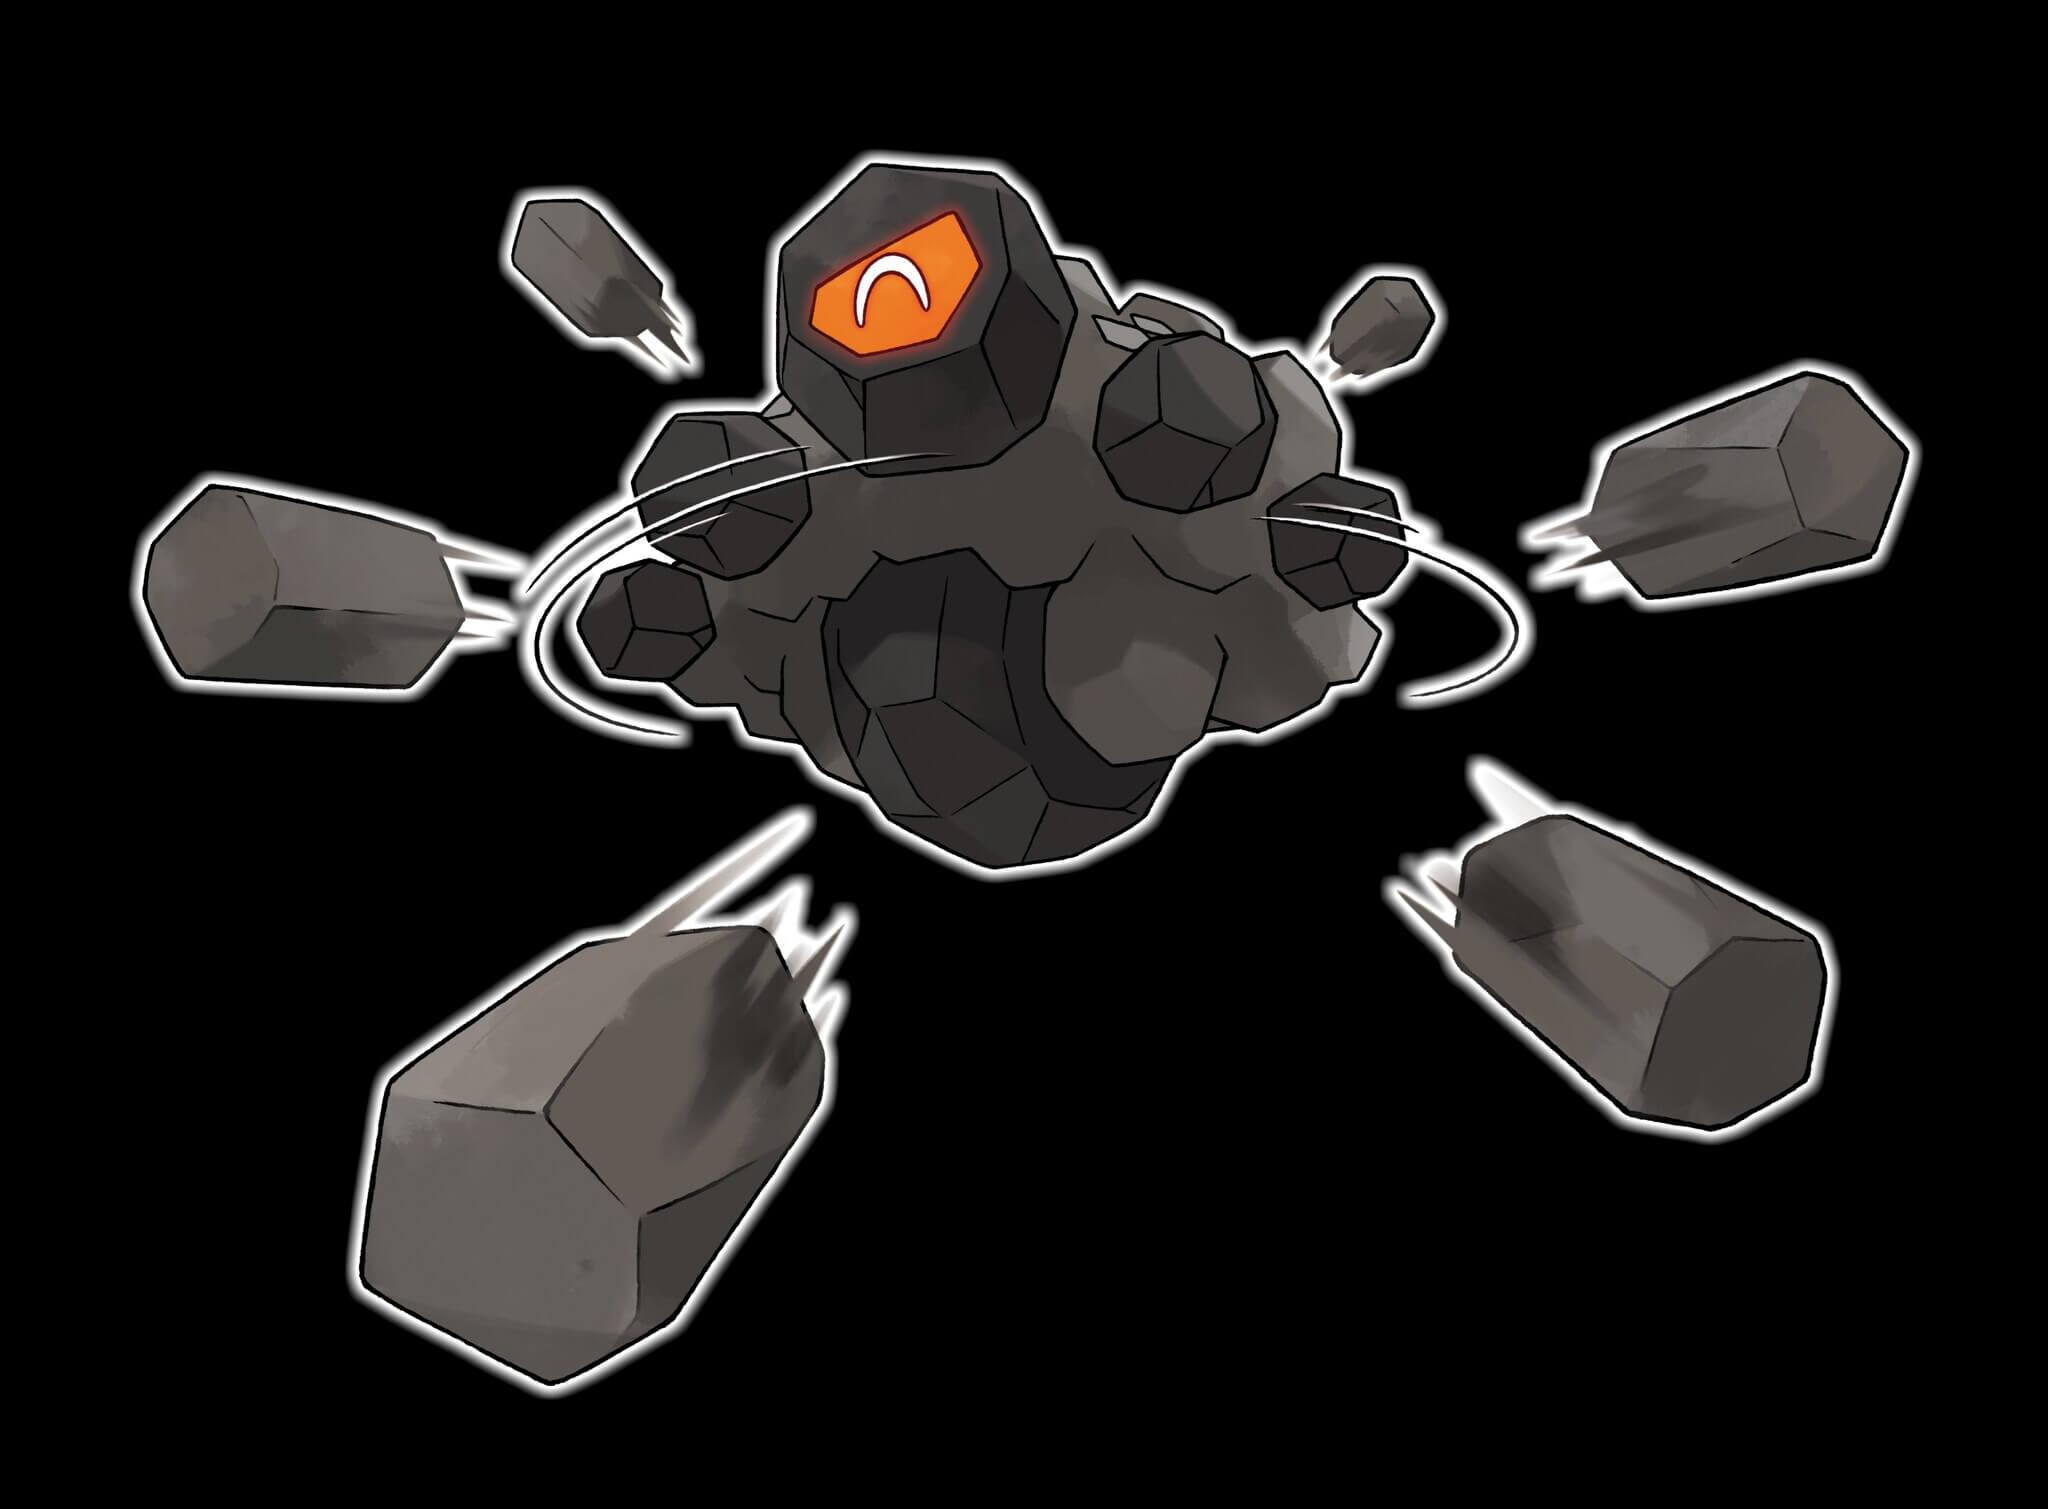 Pokémon Espada y Escudo Gigamax 12